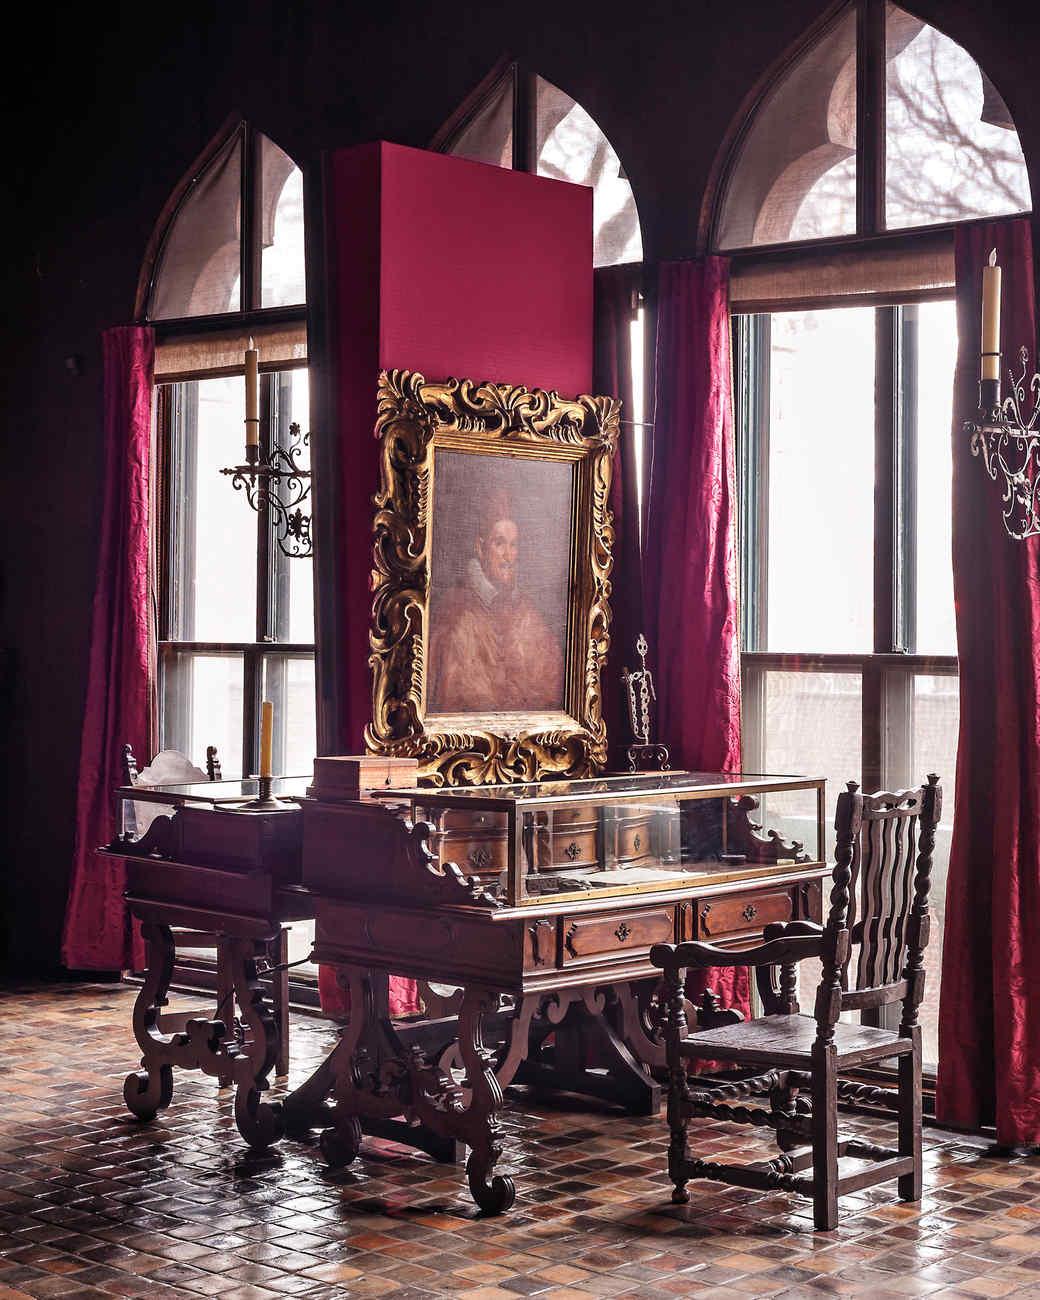 isabella-gardner-museum0001689-md110166.jpg